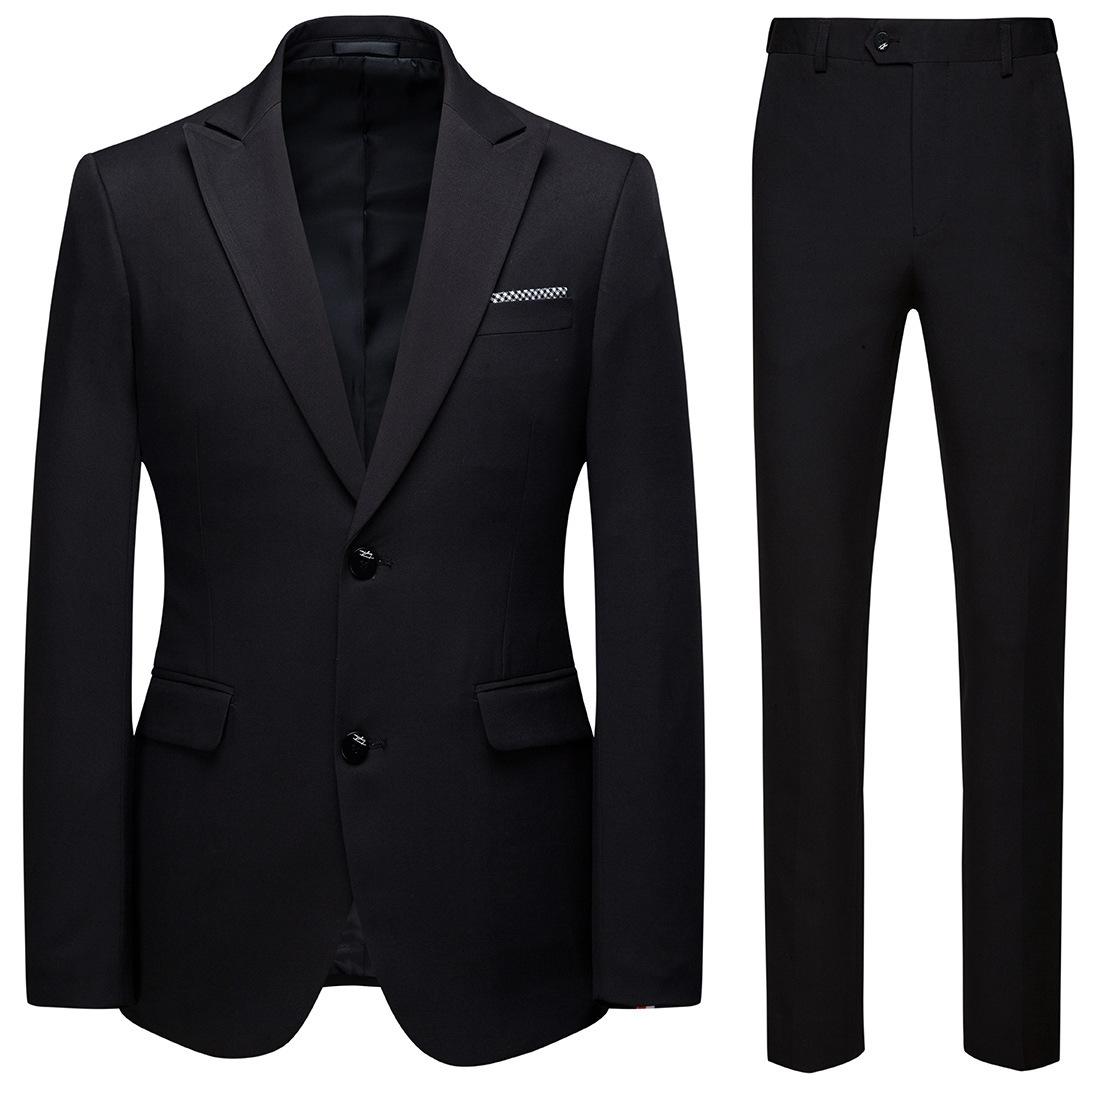 Autumn new men's business casual two piece suit two button men's slim British style large suit